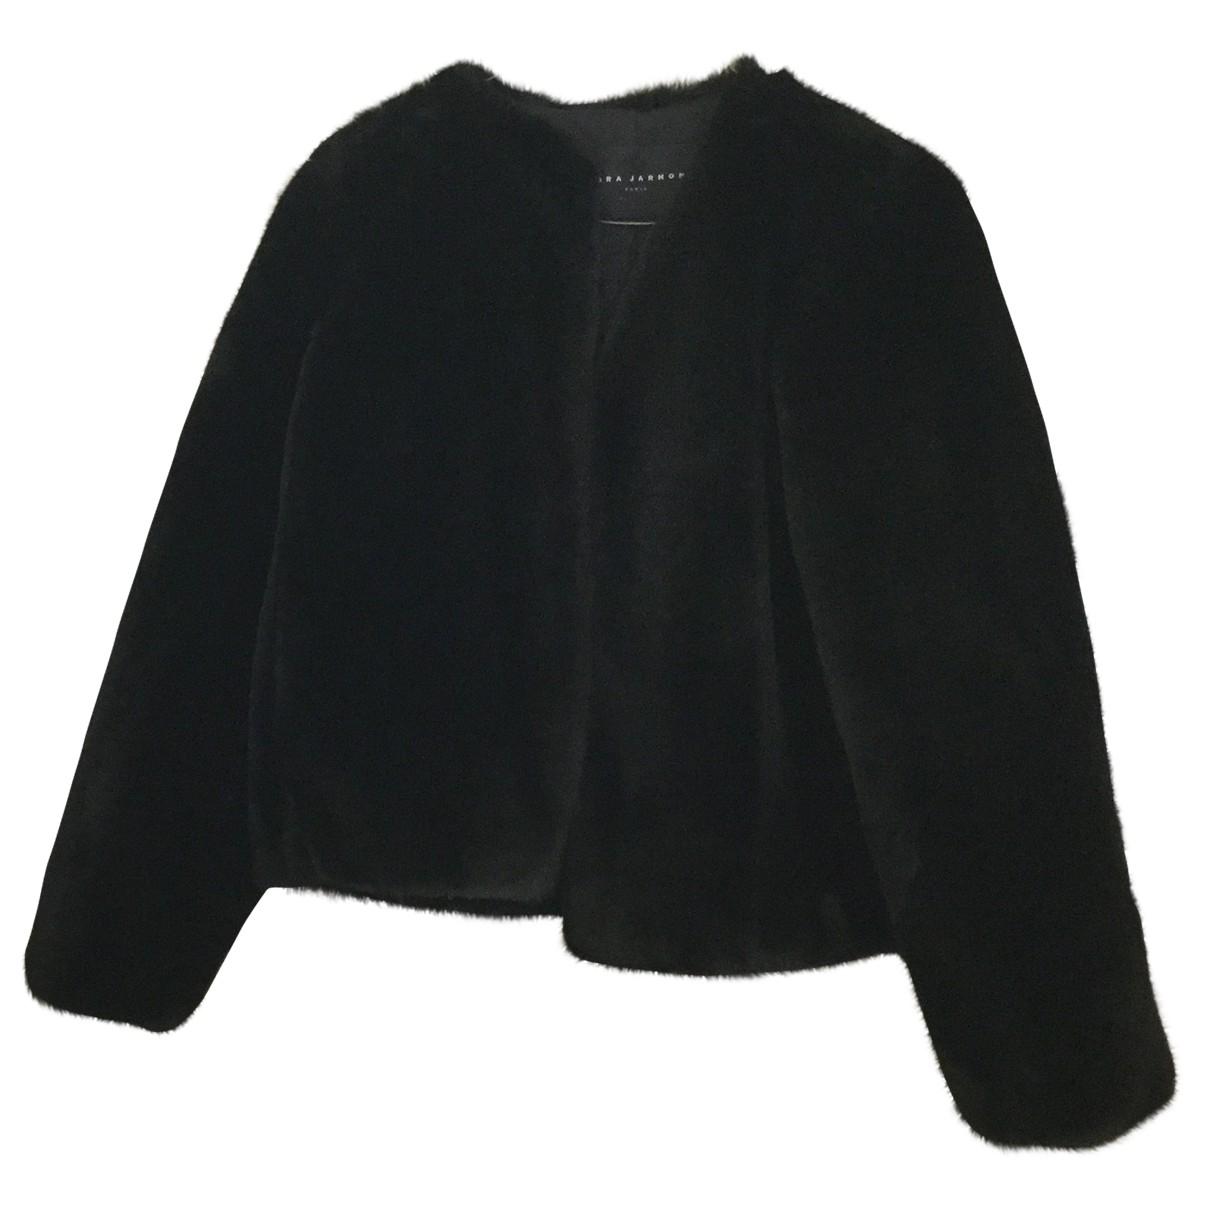 Tara Jarmon \N Black jacket for Women 36 FR